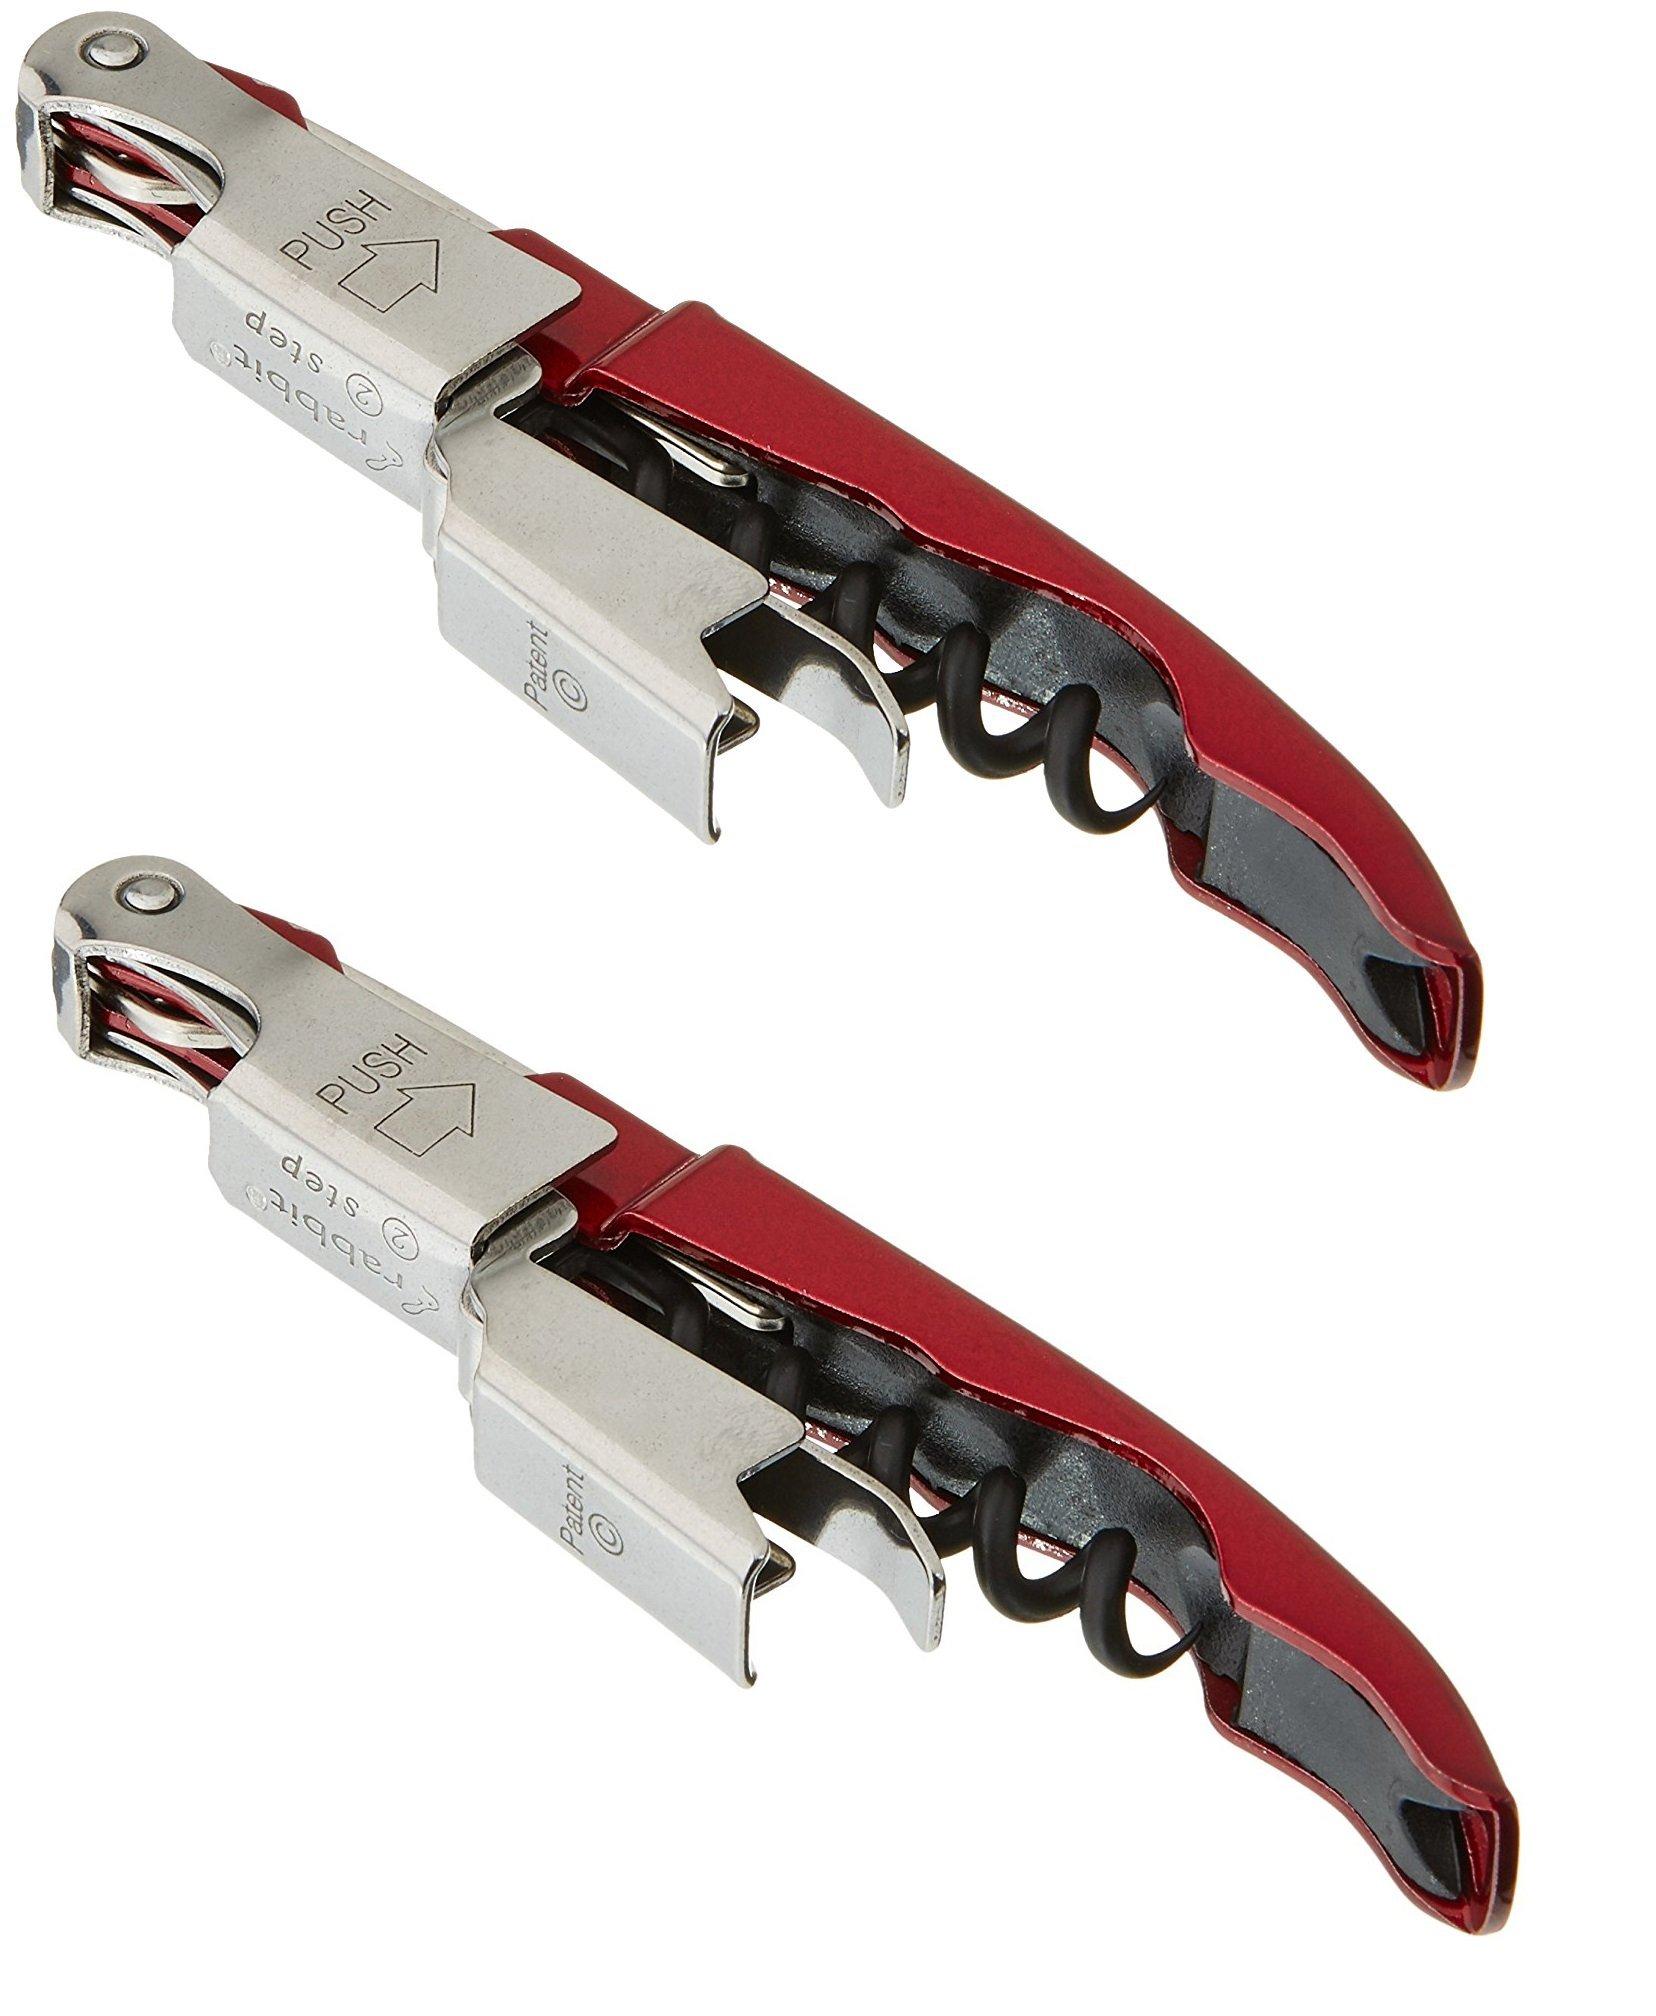 Metrokane Wine Opener Zippity 2-Step Corkscrew